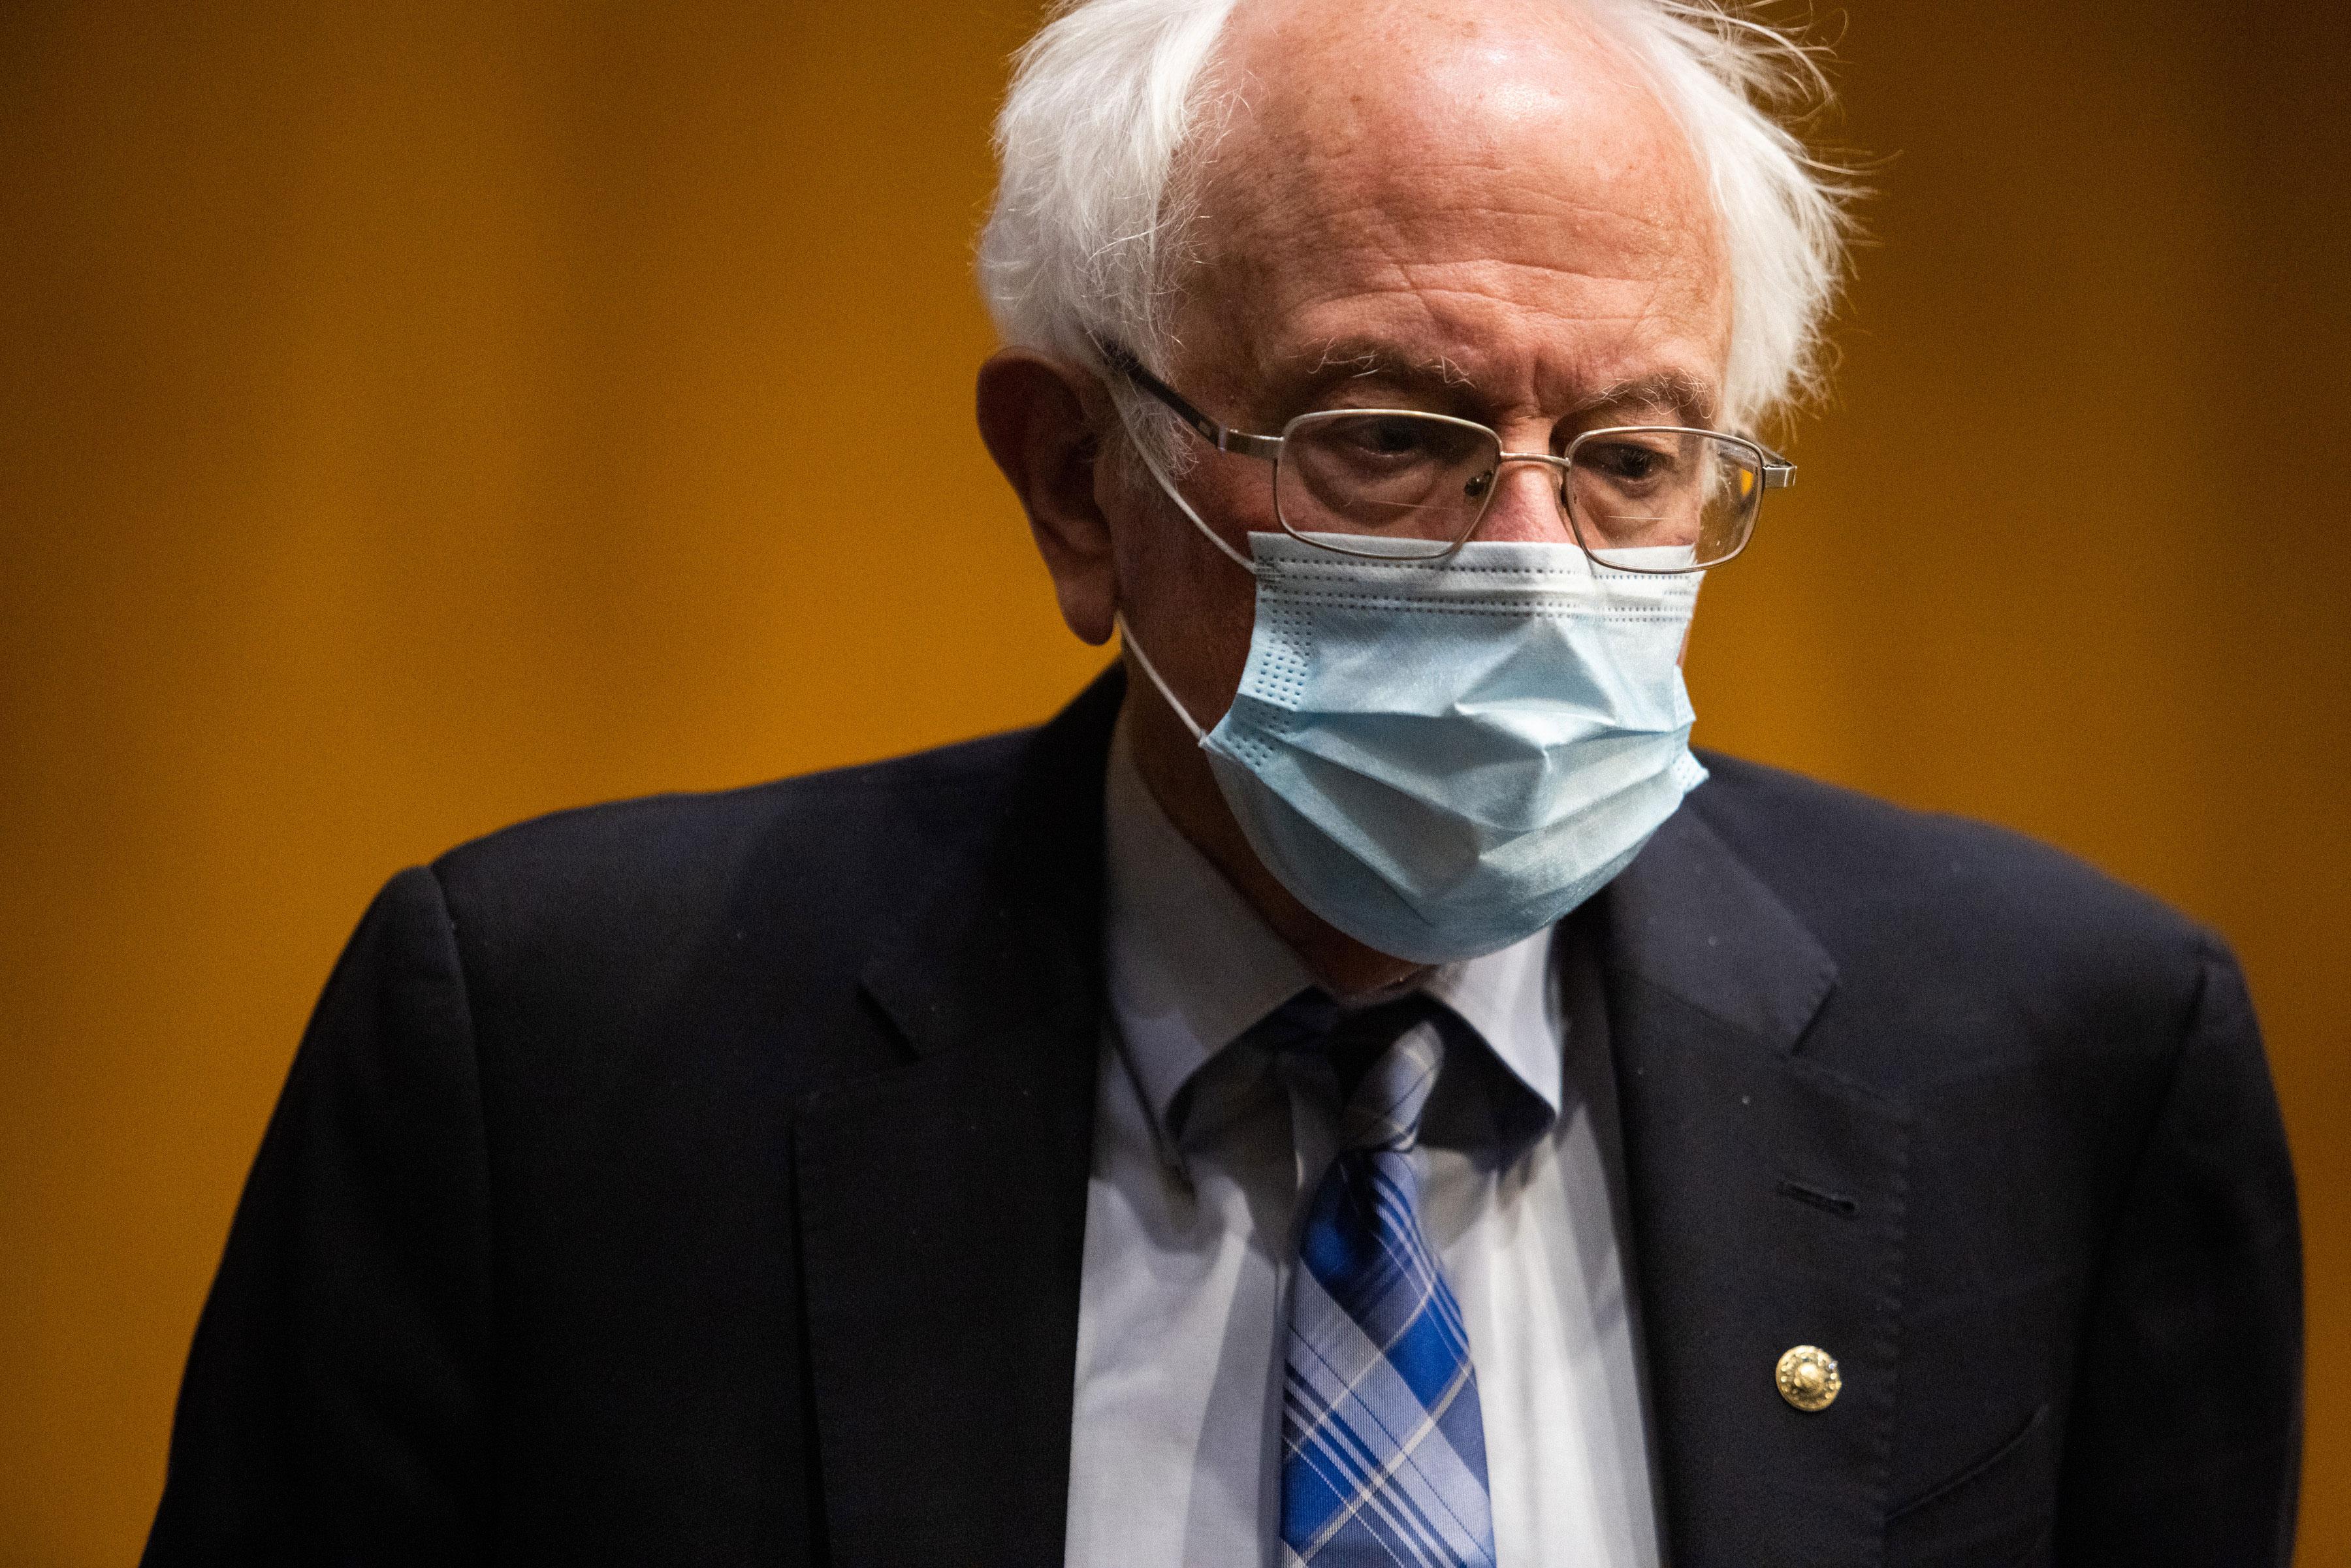 Sen. Bernie Sanders attends a confirmation hearing on January 27 in Washington, DC.